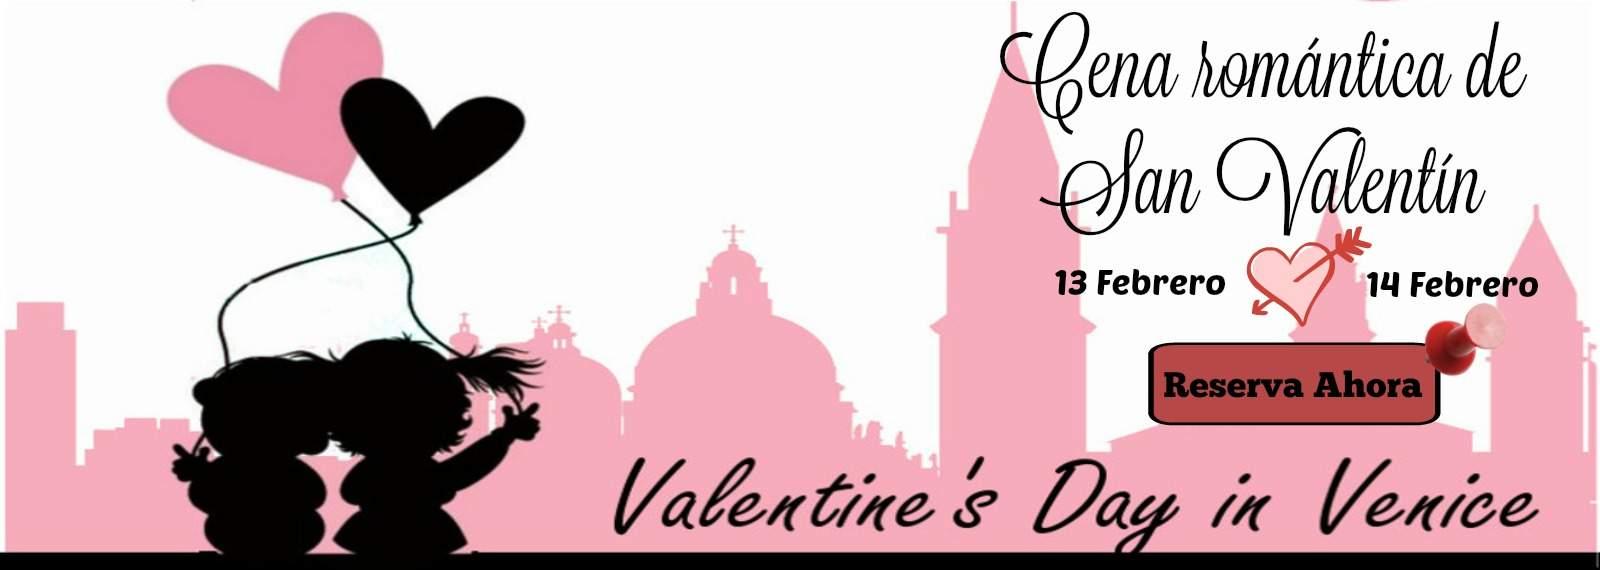 Cena romántica de San Valentín